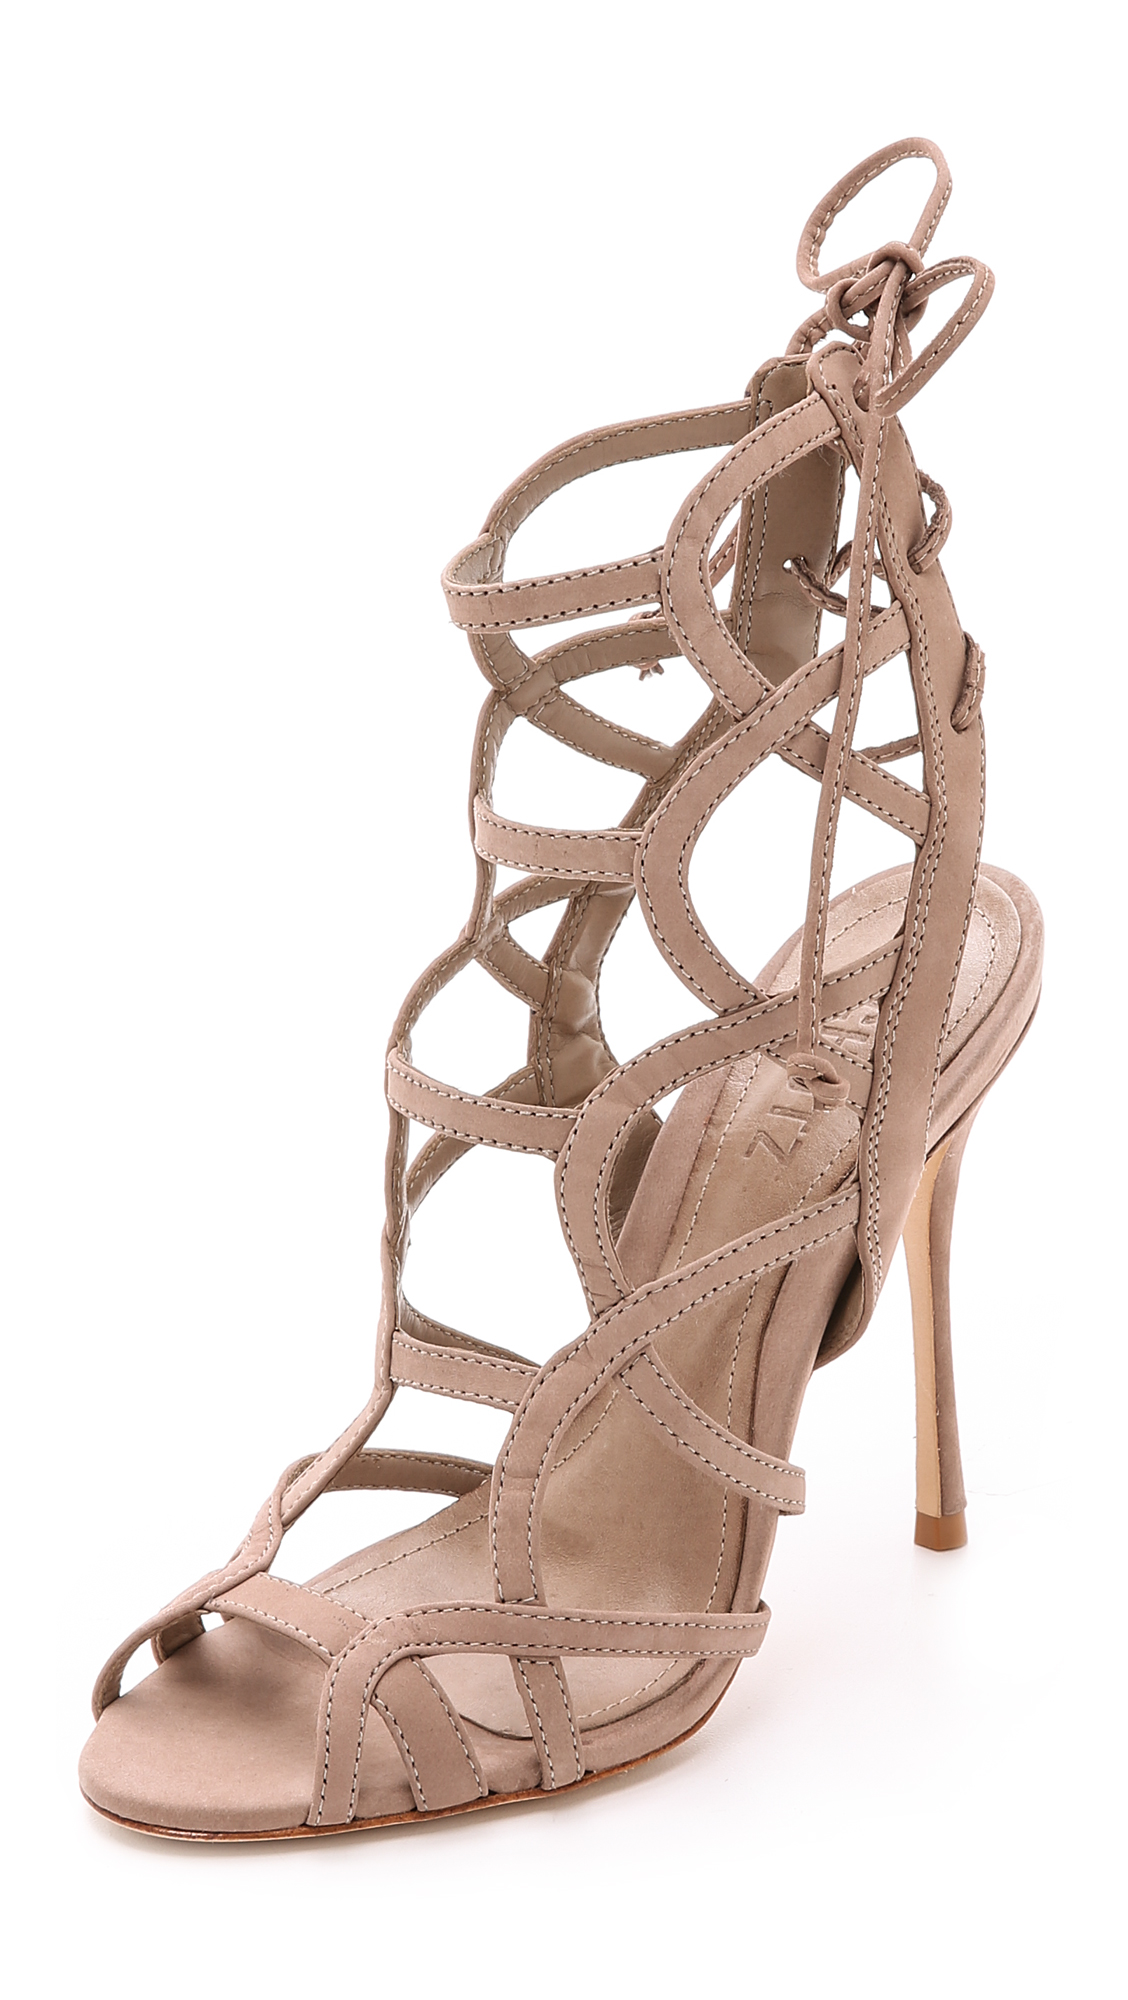 7a13bb2304 Schutz Joelle Strappy Sandals | SHOPBOP